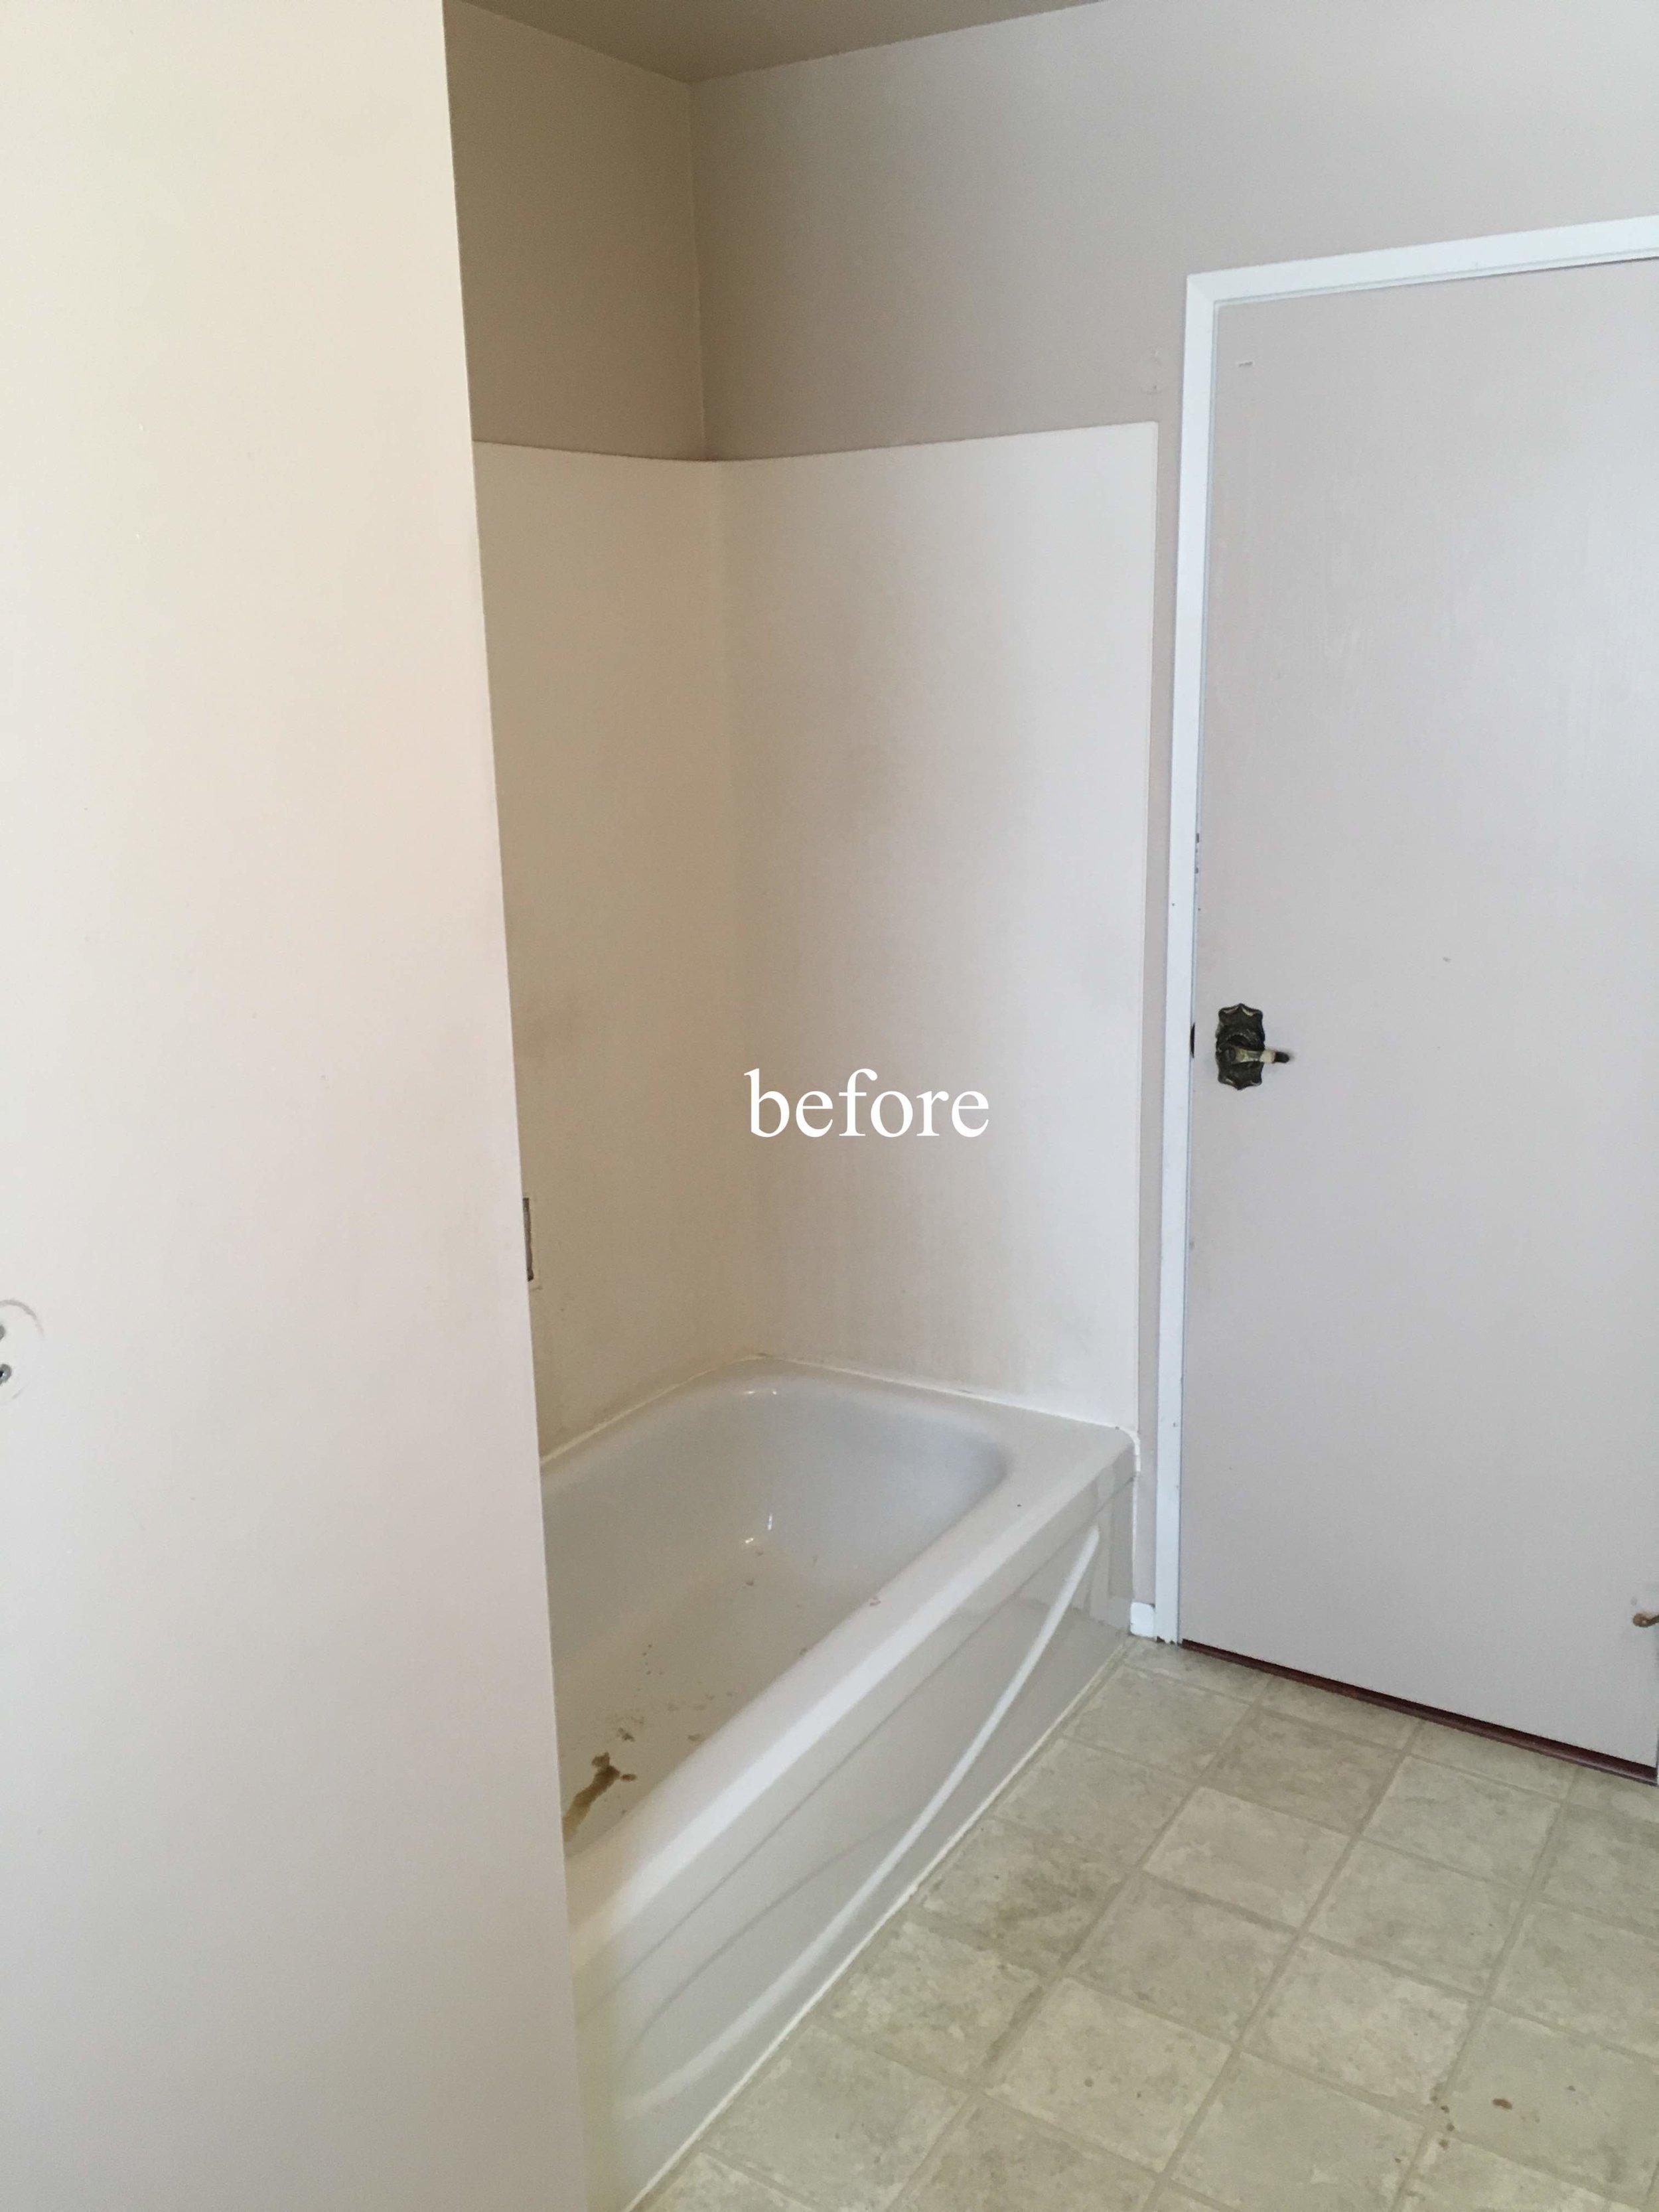 Before a bathroom renovation in Kimberley, BC, East Kootenays.